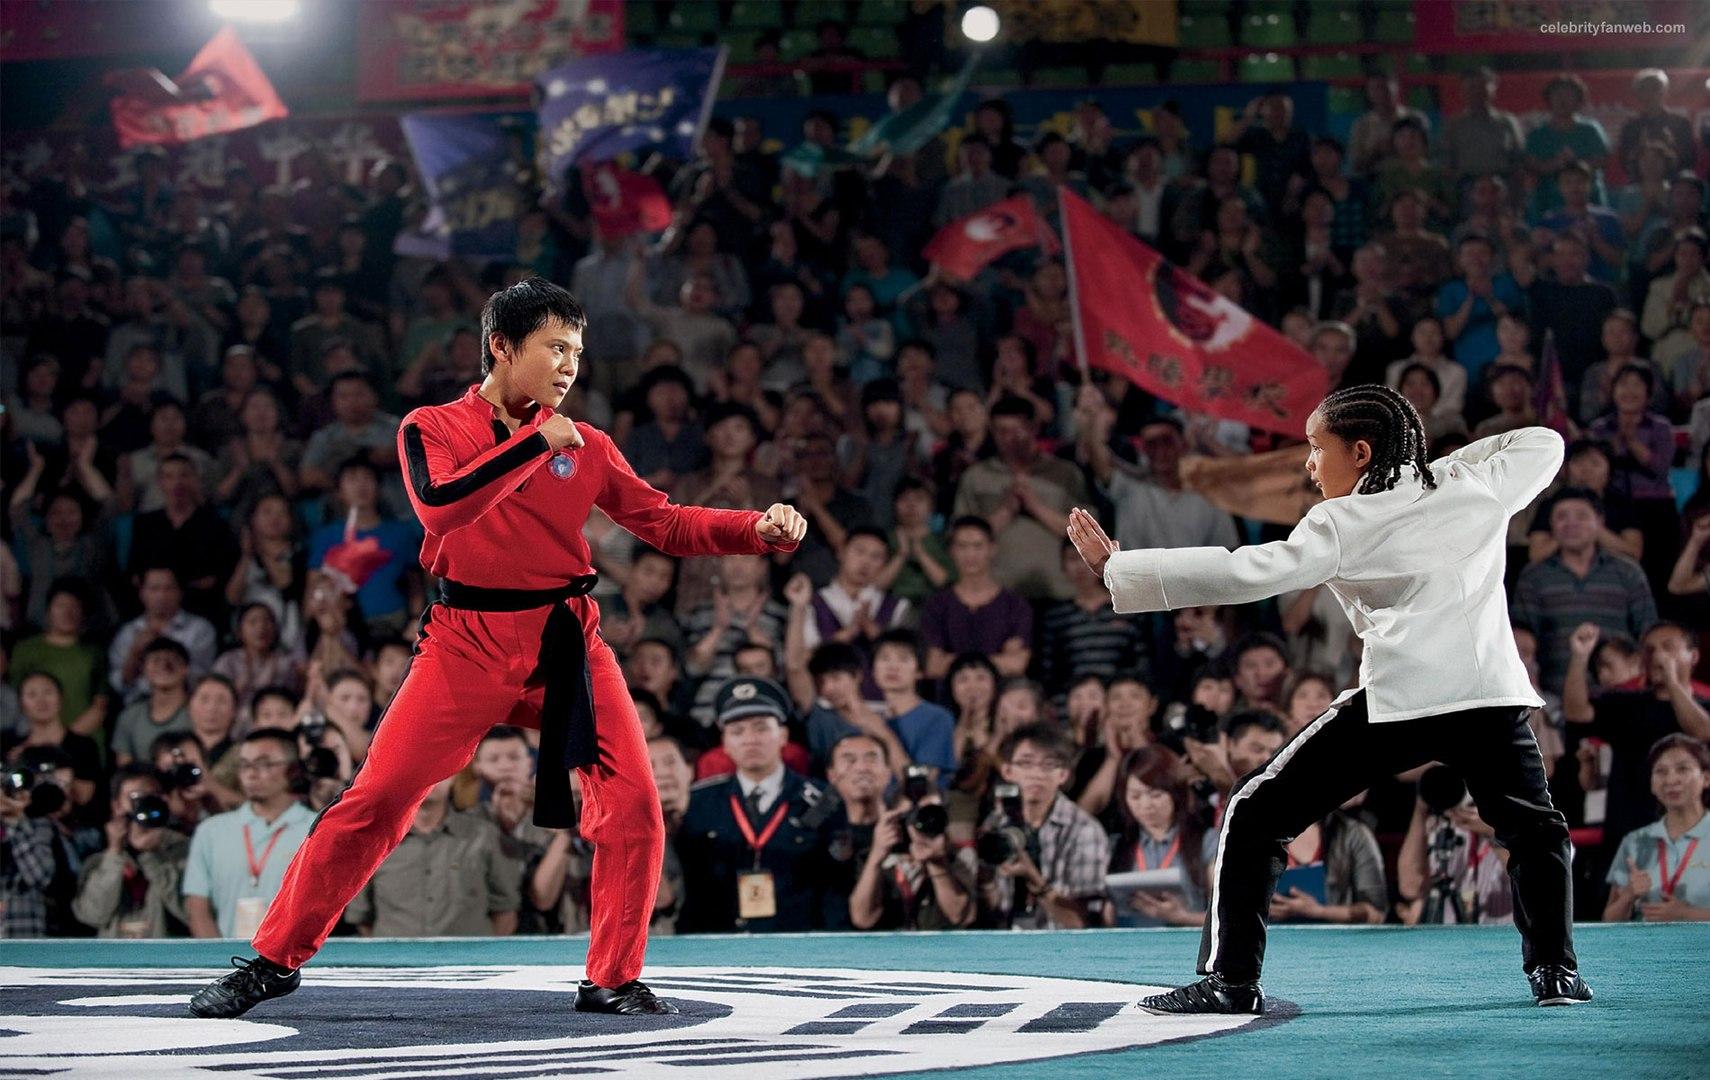 The Karate Kid Full Movie HD 1080p